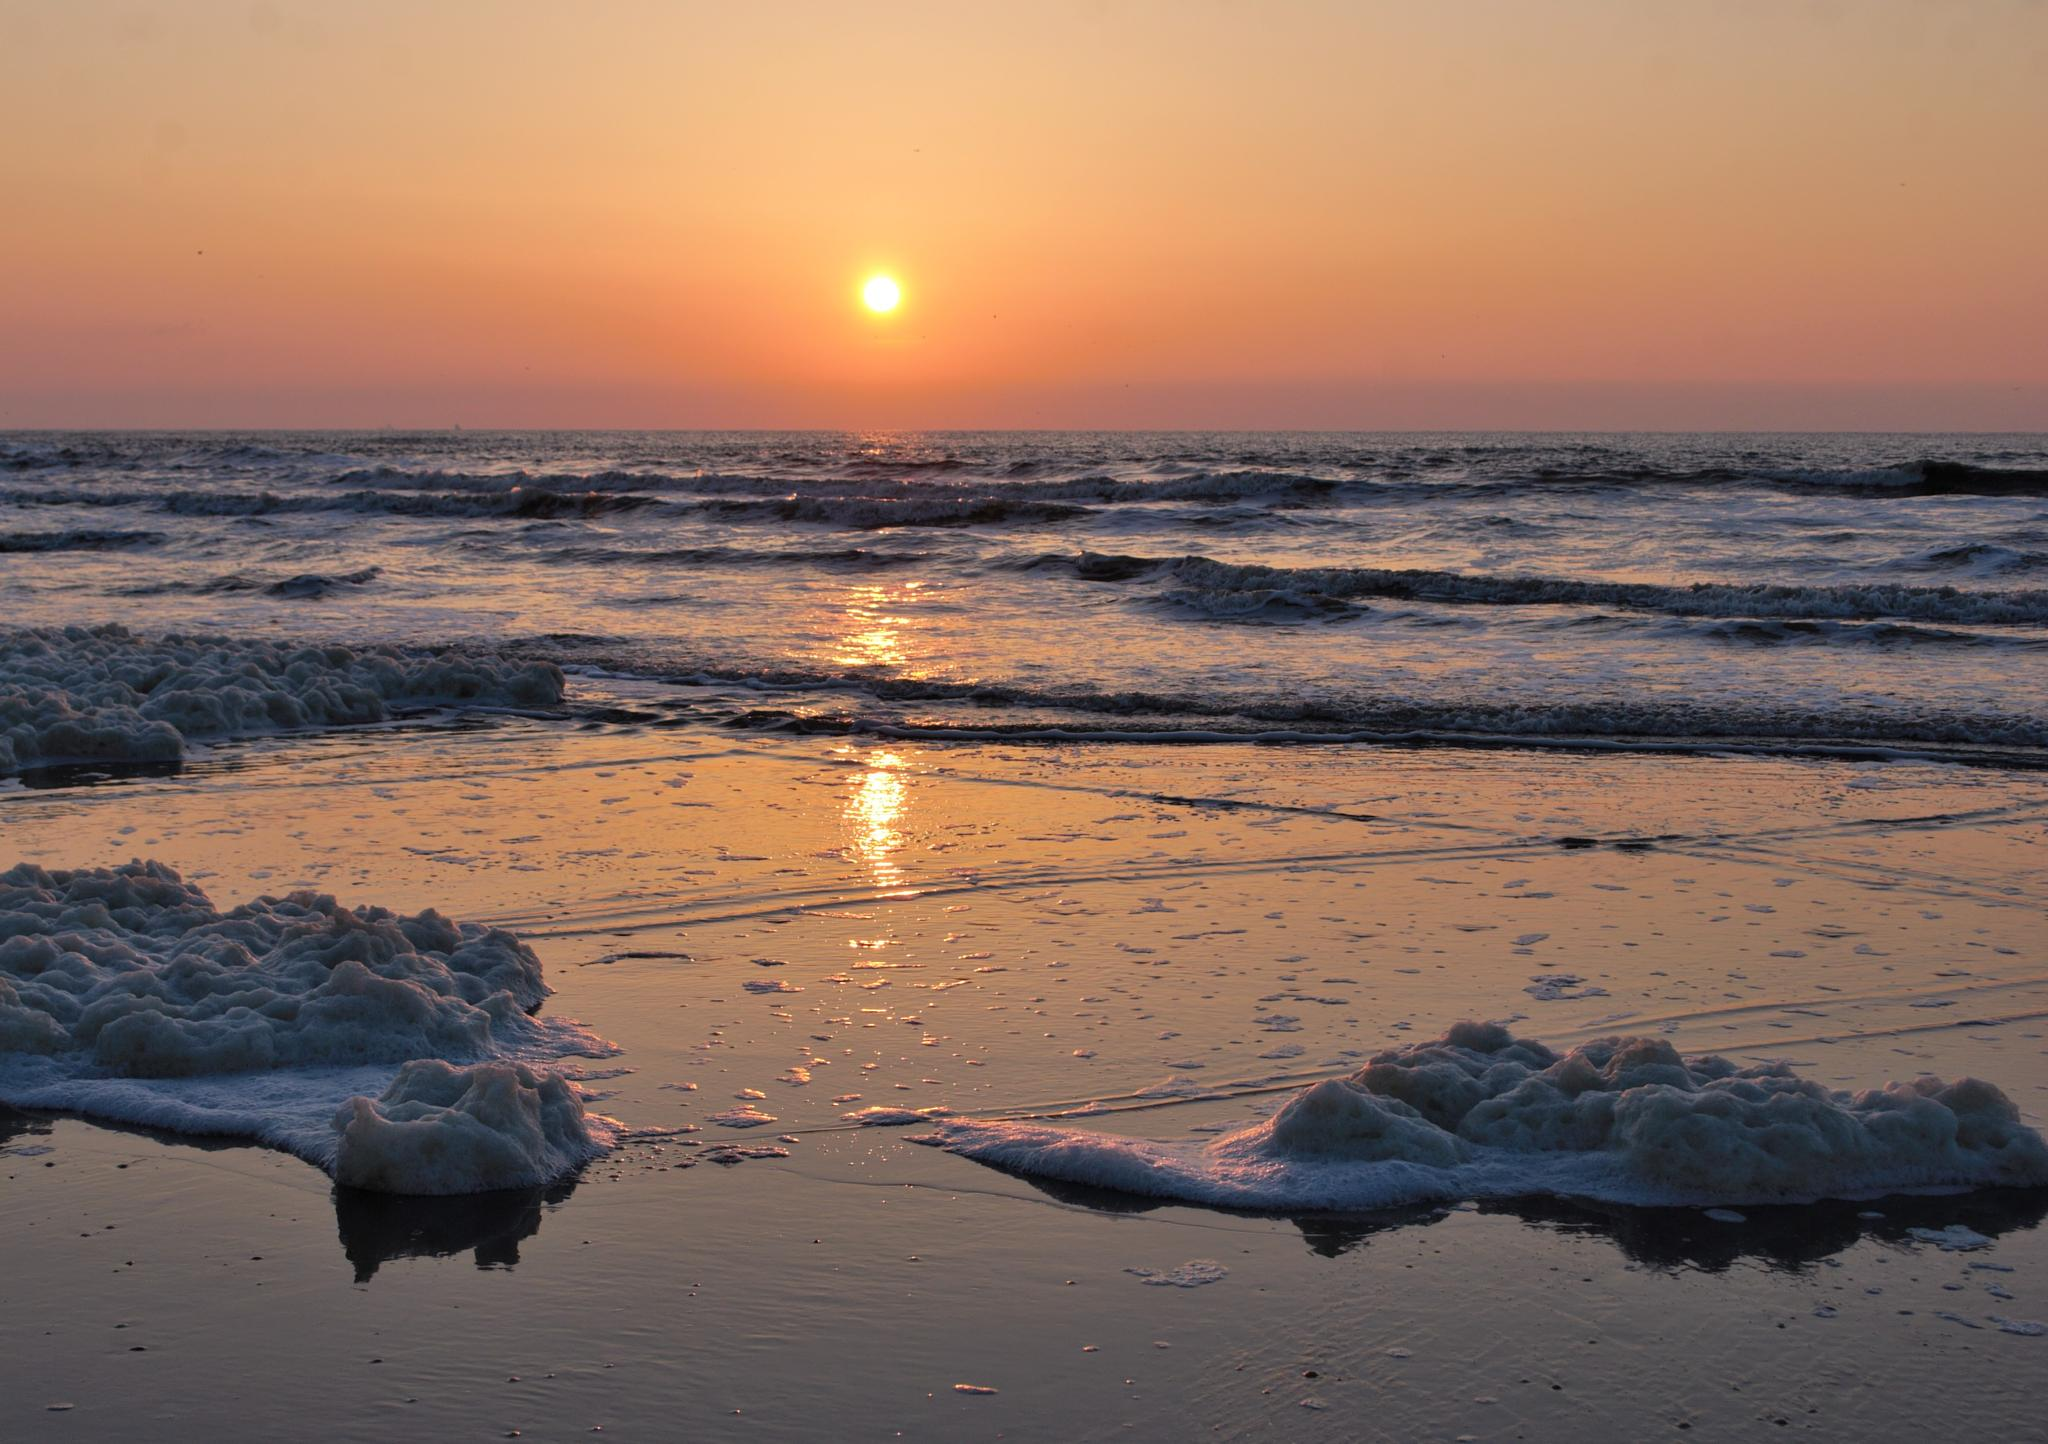 Sunset by KittySchulz